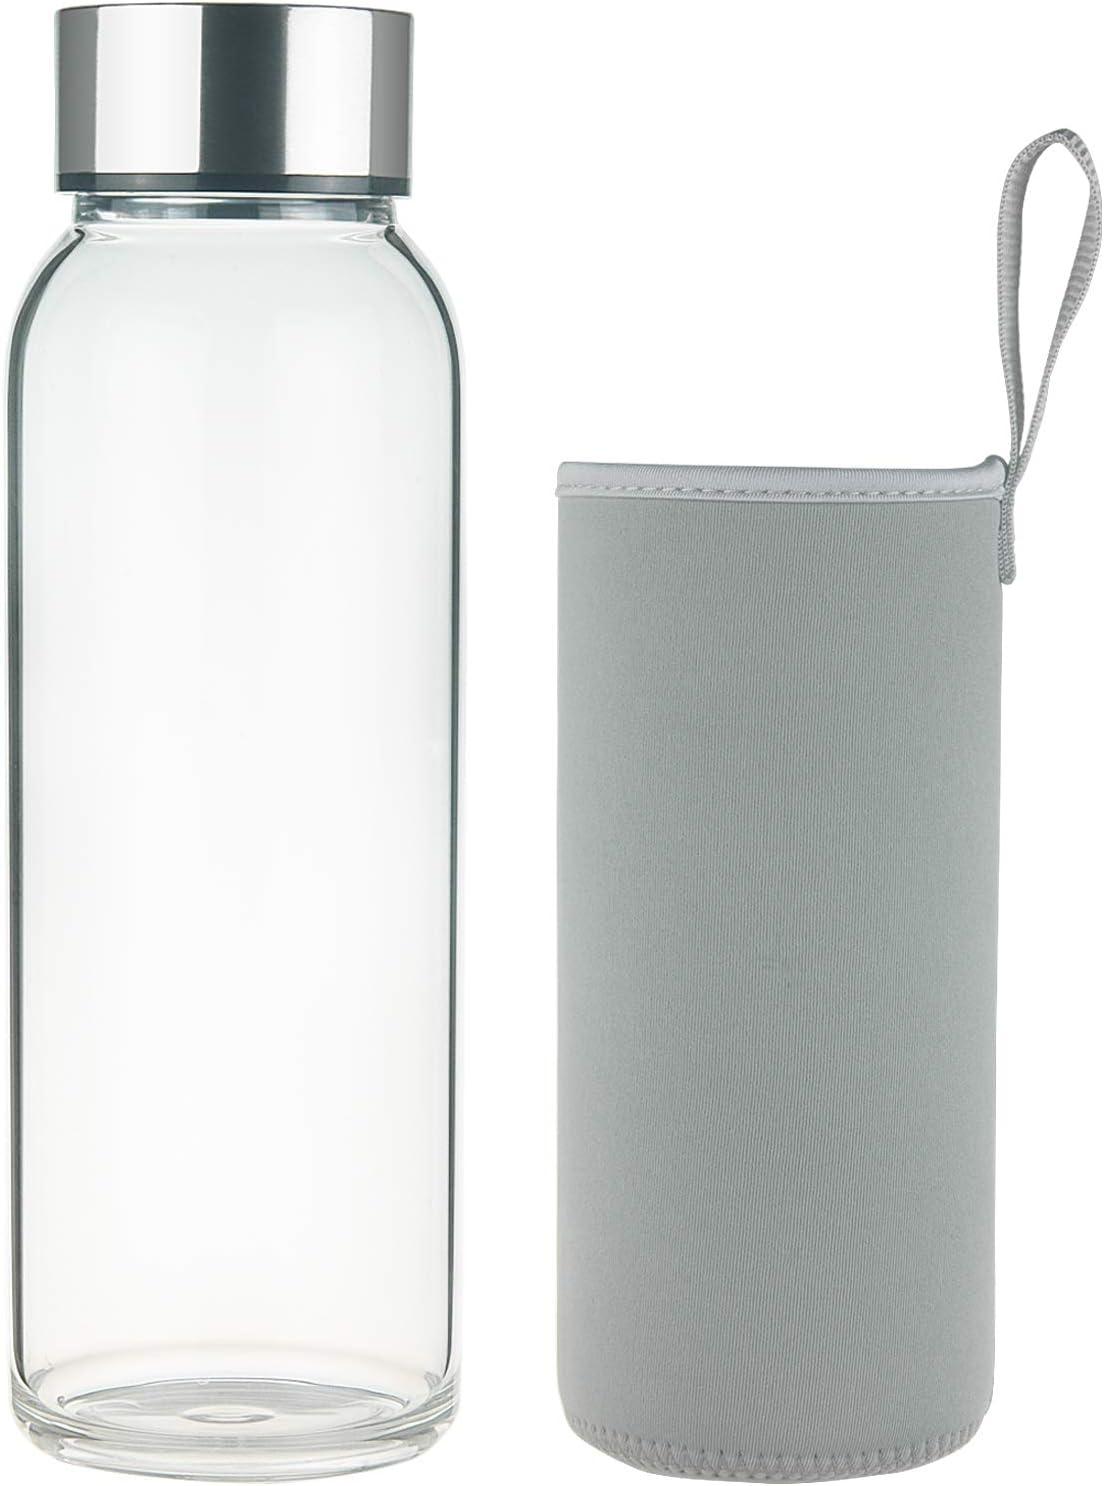 FCSDETAIL Botella de Agua de Cristal sin BPA, Botella de Agua de Vidrio de Borosilicato con Funda de Neopreno y Tapa de Acero Inoxidable 1000ml / 1500ml